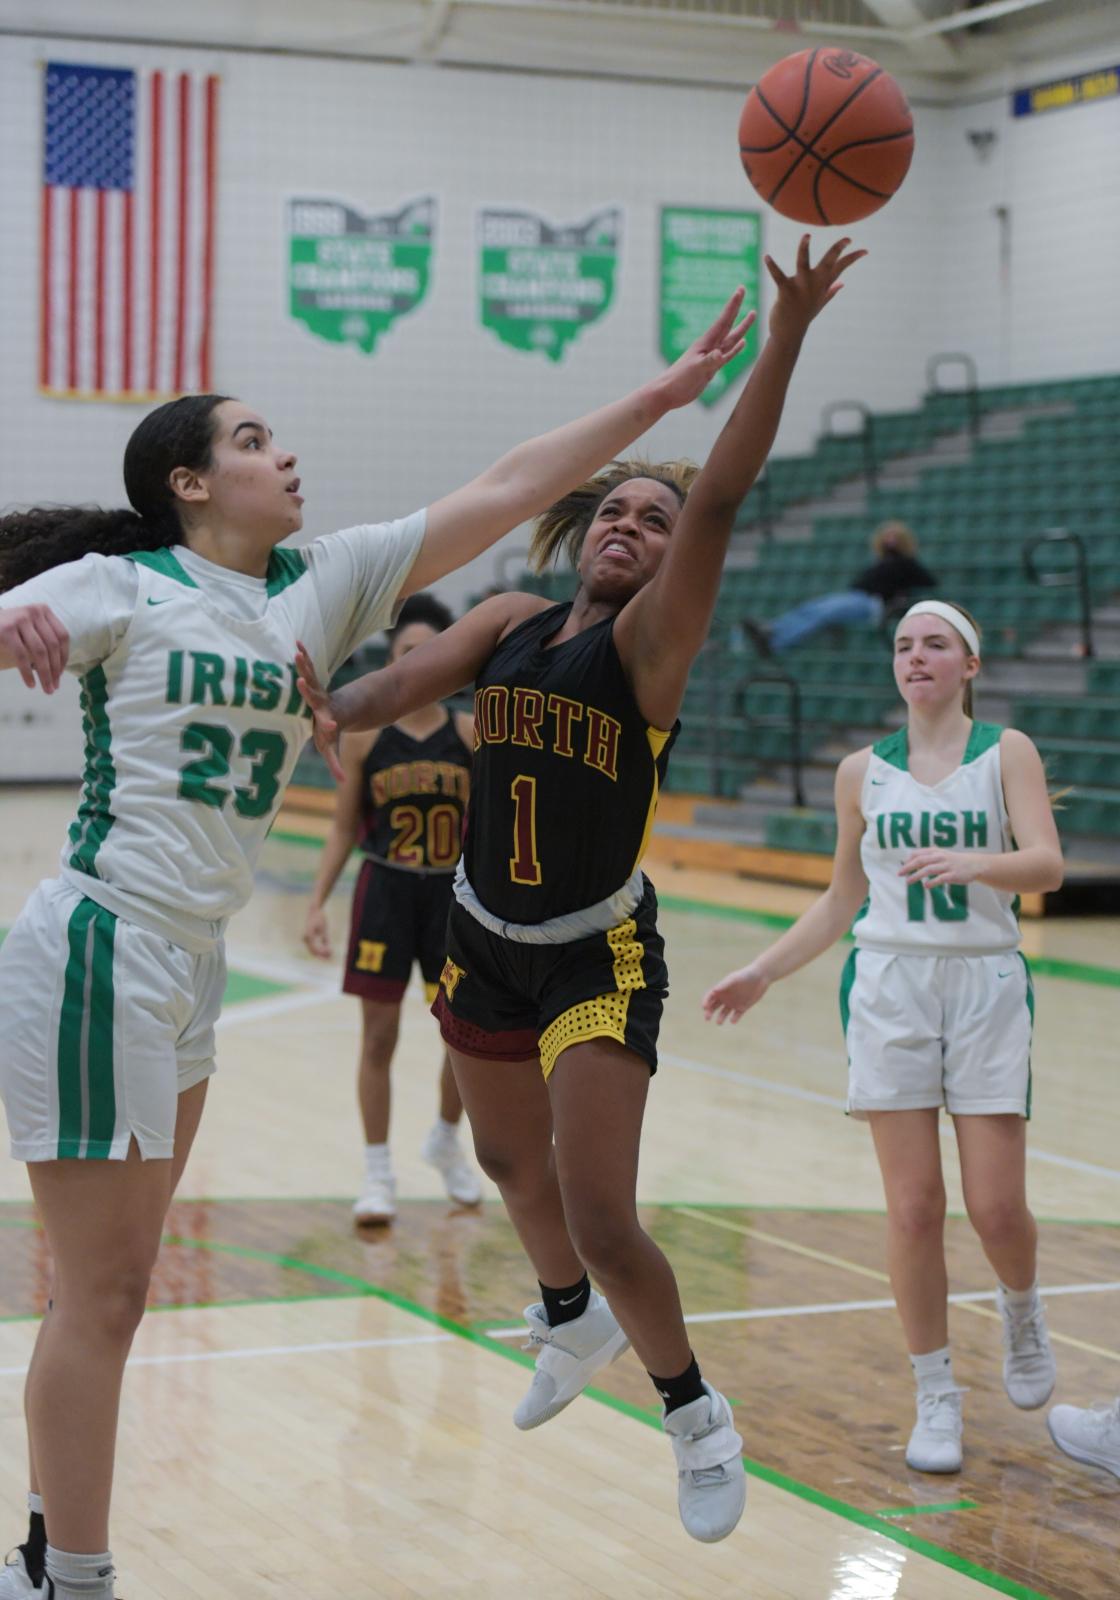 PHOTO GALLERY: North girls basketball team defeats Scioto 41-38